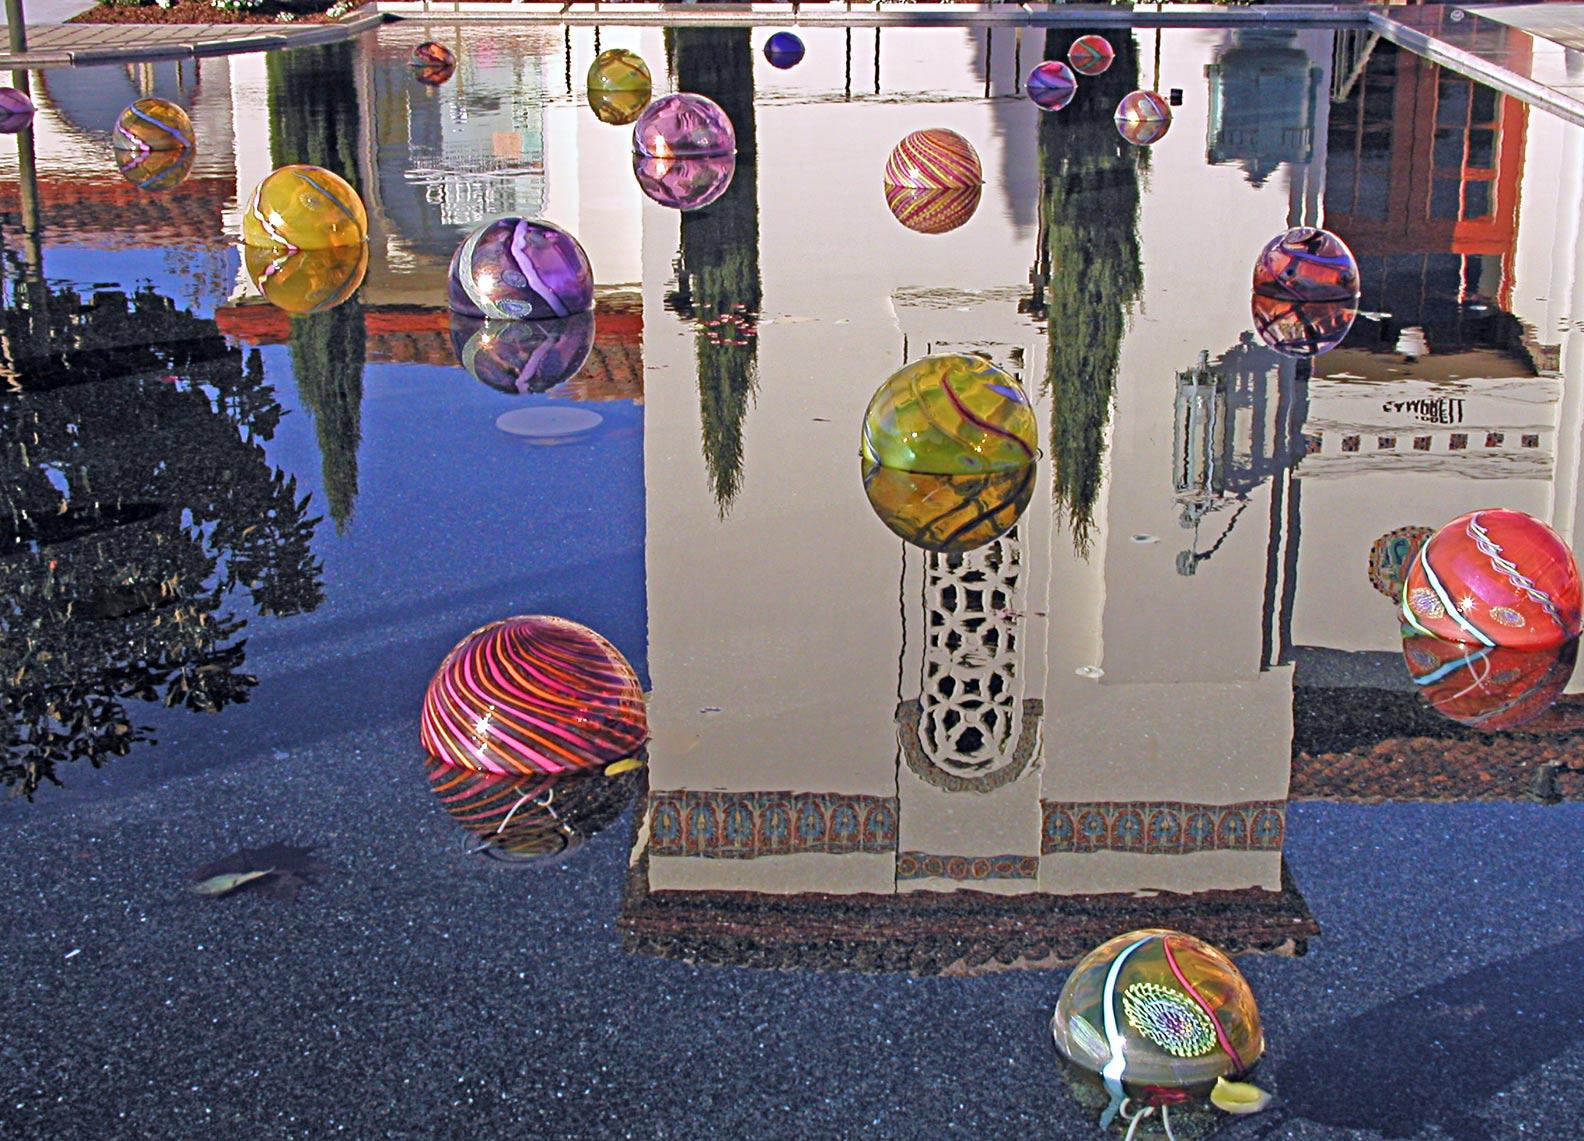 Balls-pool-reflection-11-27-05-mod